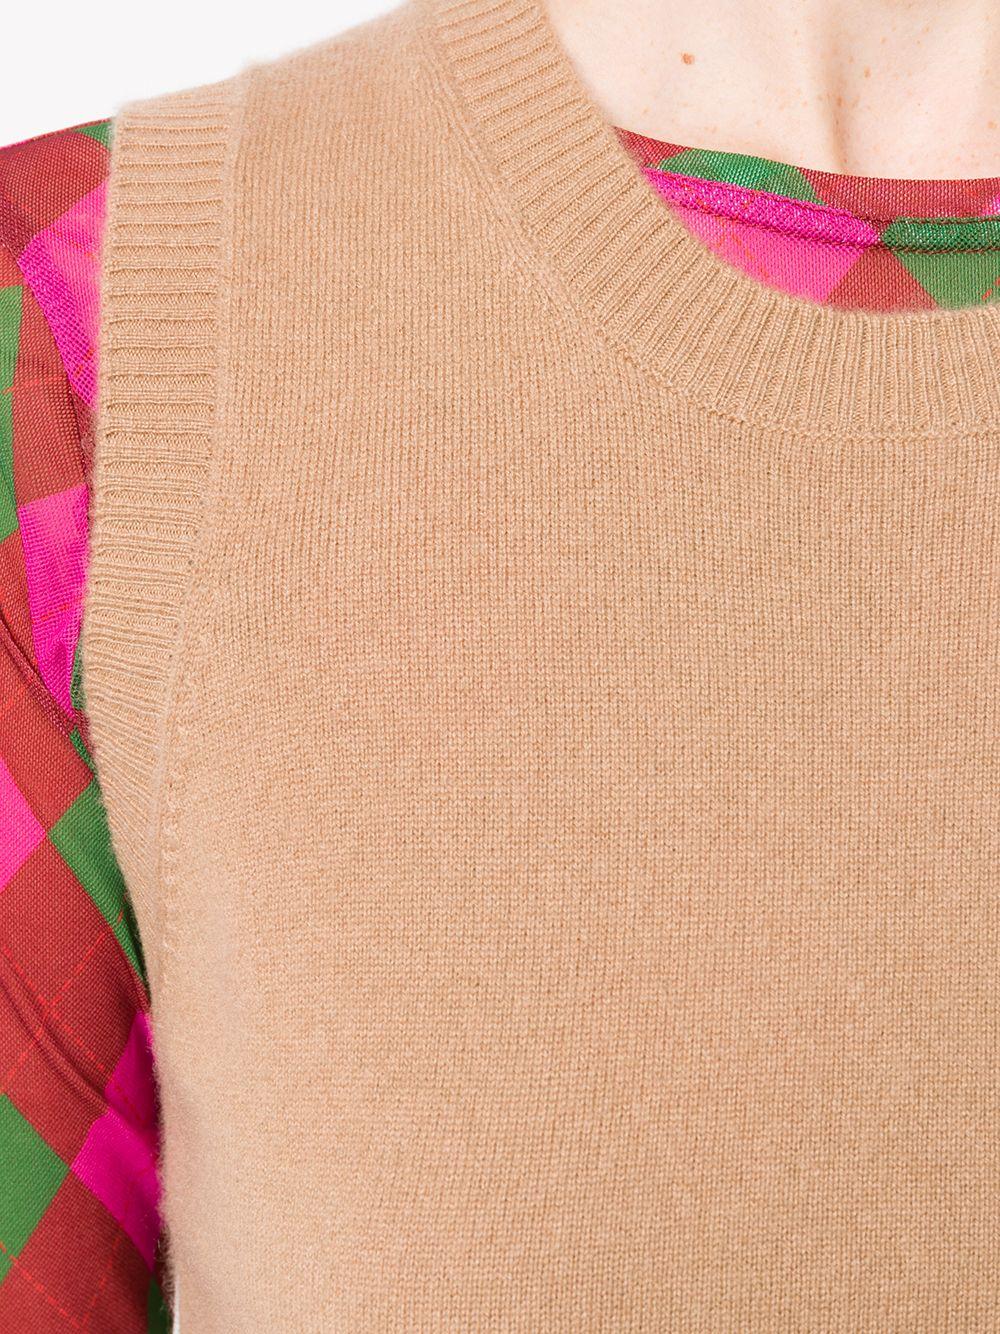 Camel brown cashmere knit tank top  P.A.R.O.S.H. |  | D510896-WAZE006